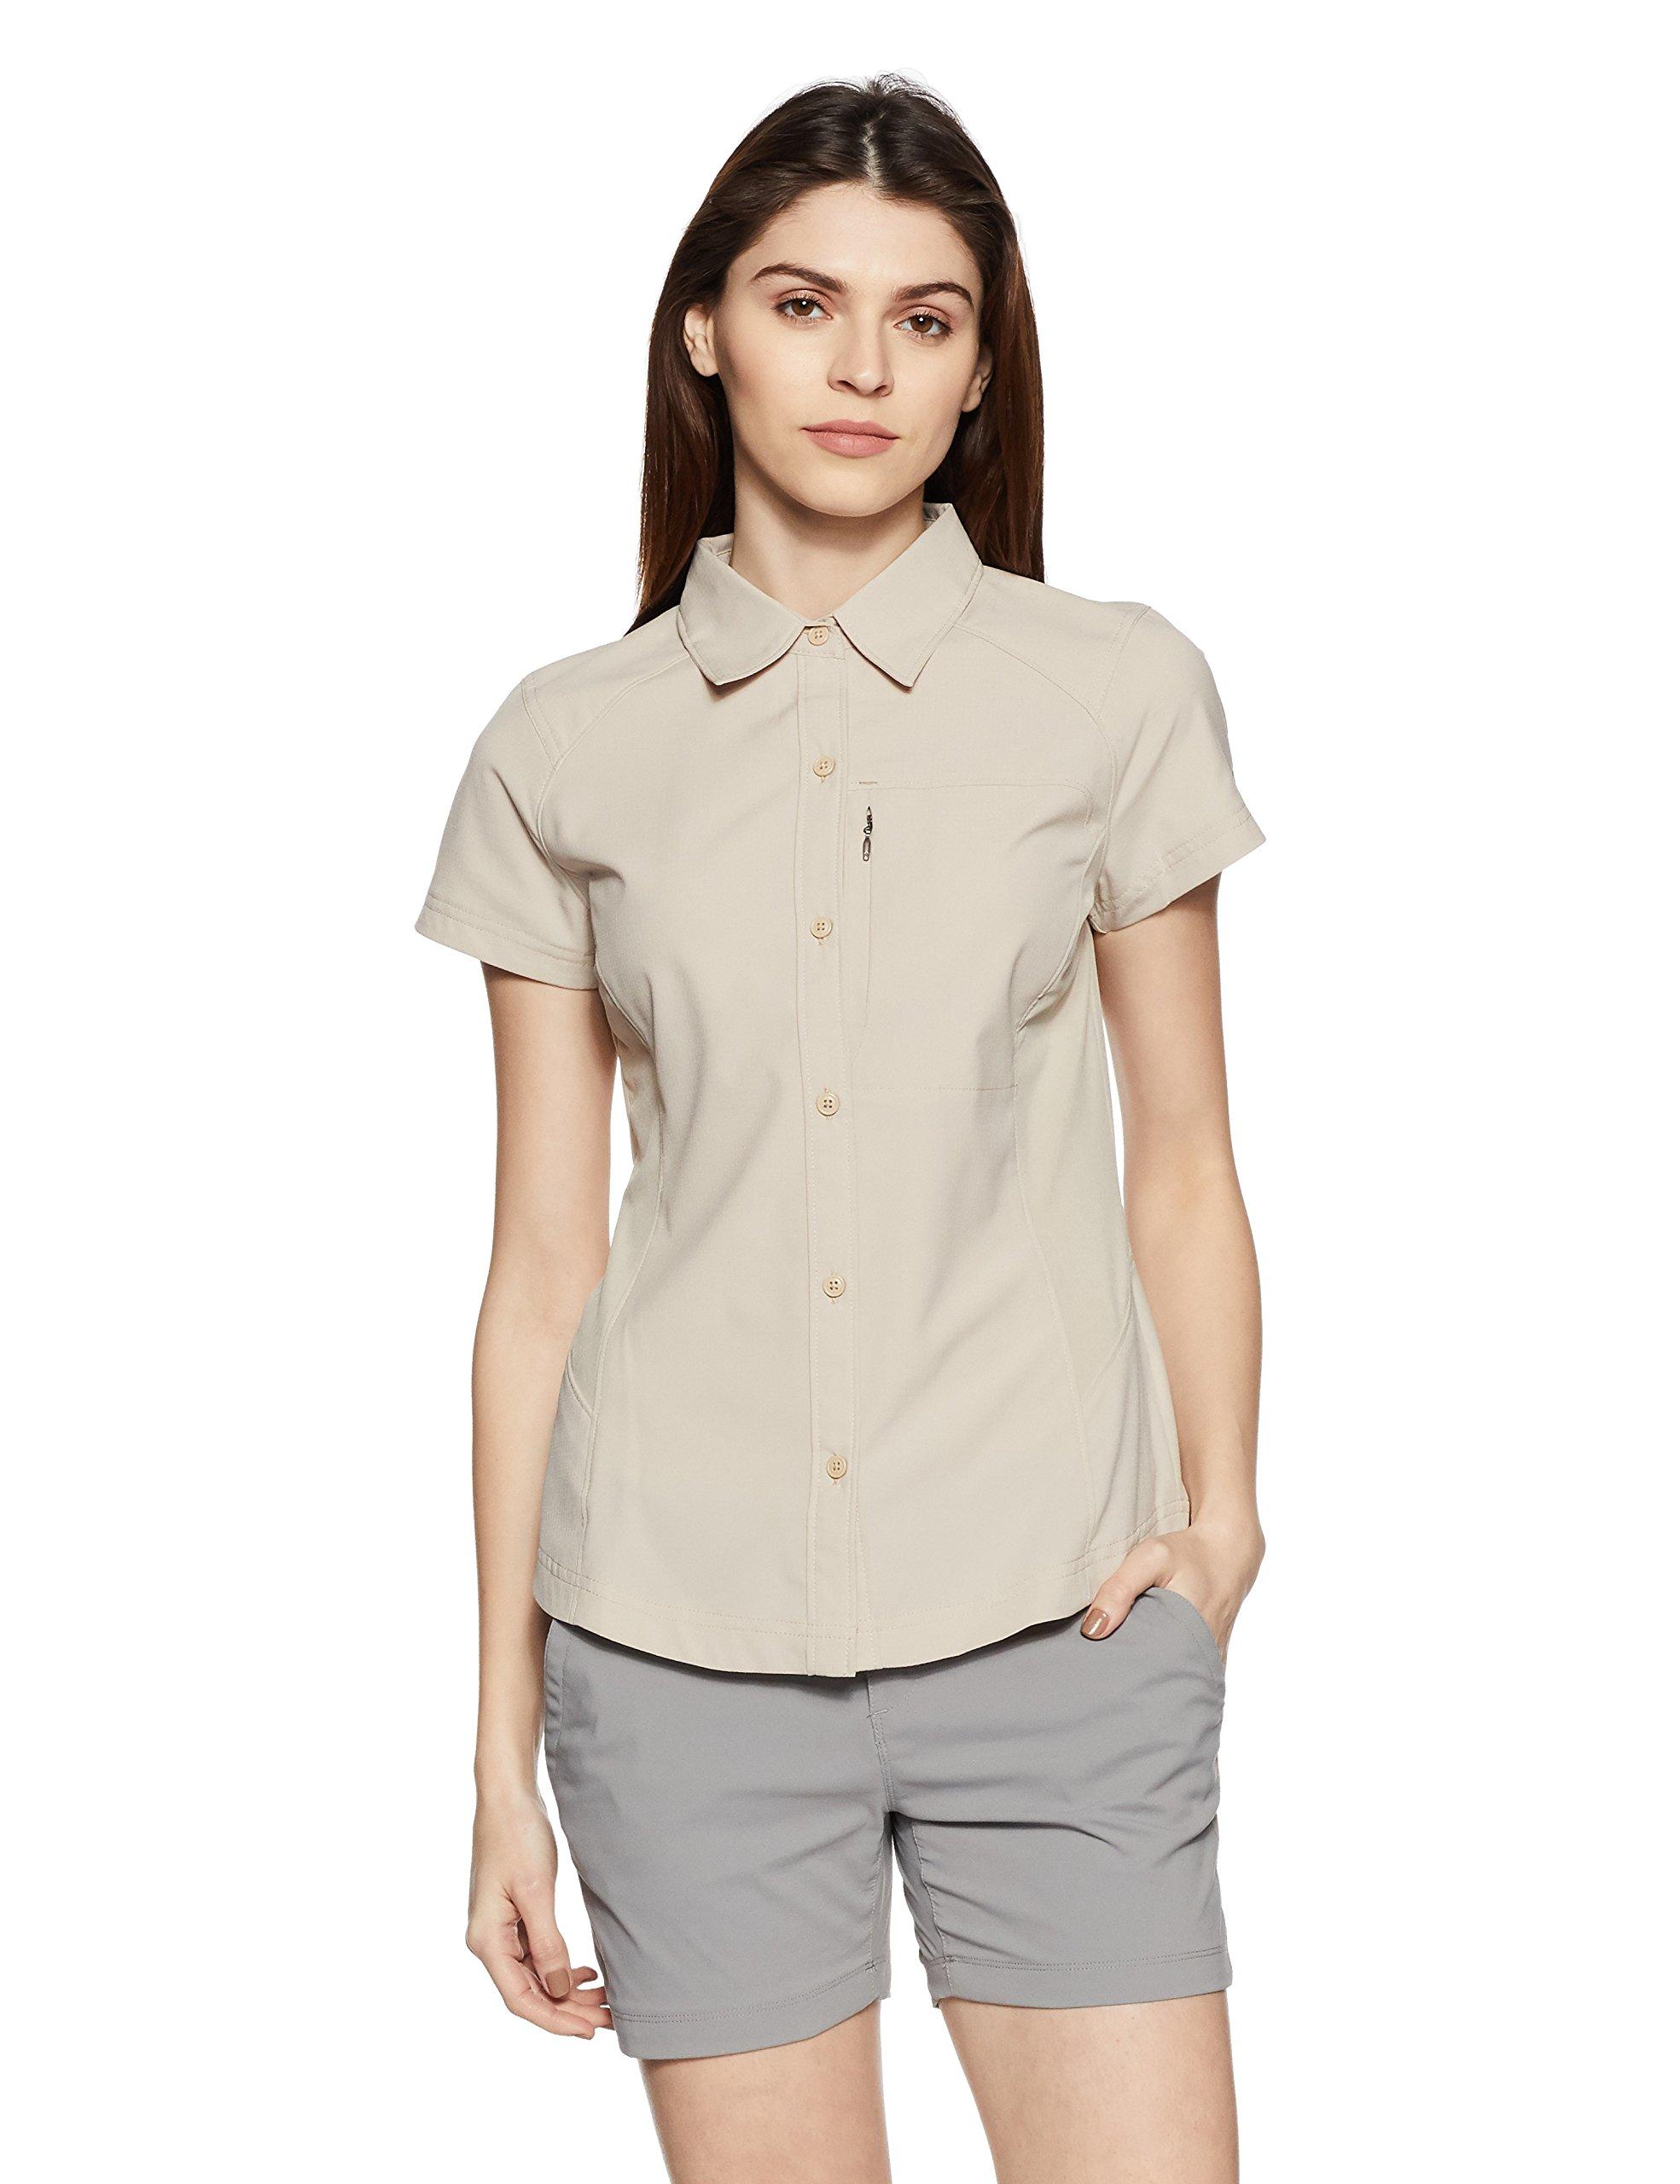 d3f91b5f5d7 Columbia Kurzarm-Wanderhemd für Damen, Silver Ridge Short Sleeve Shirt,  Nylon product image